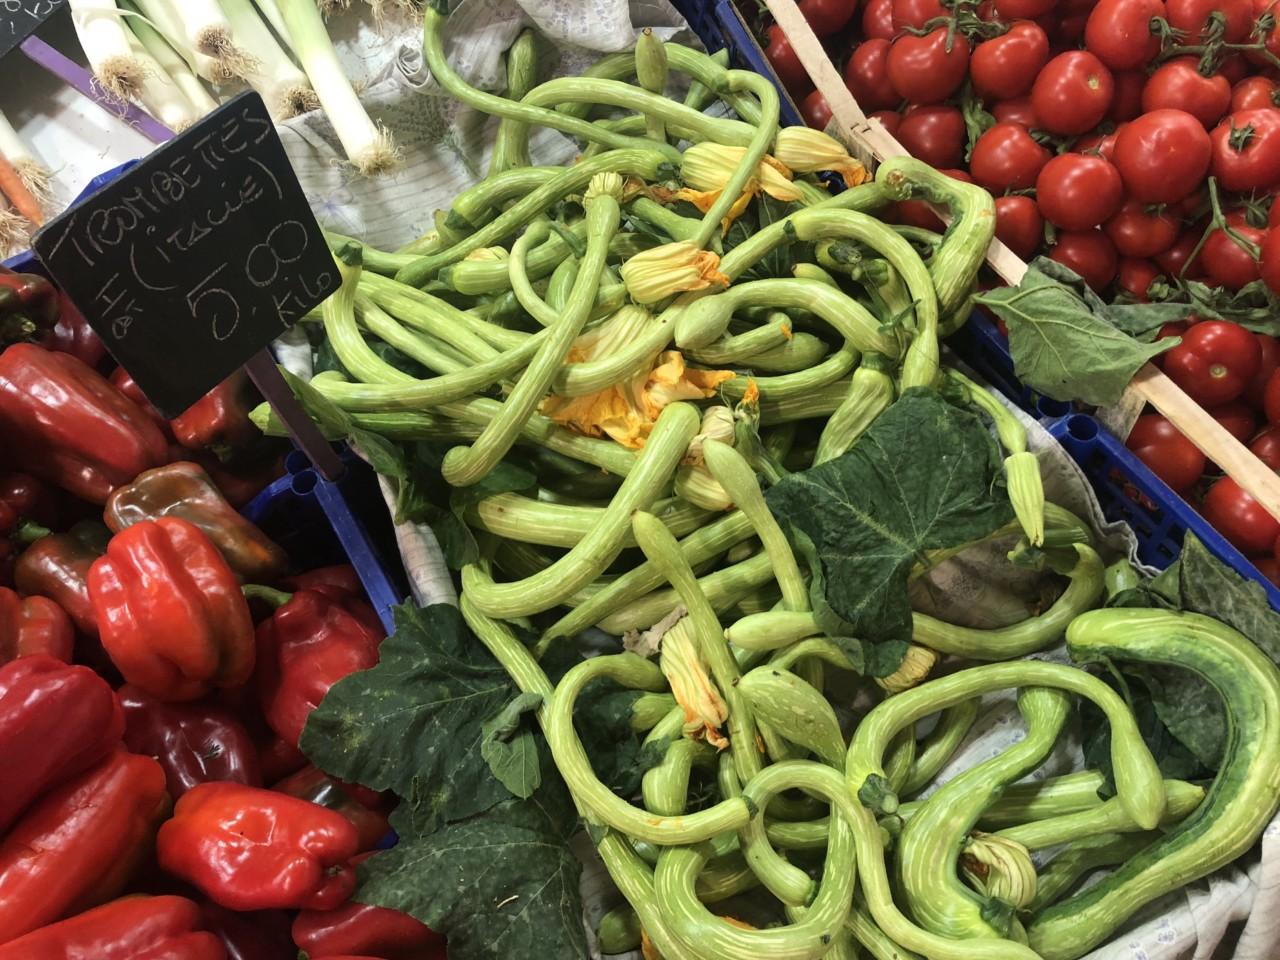 squash-blomster-trompettes-marked-frankrike-italia